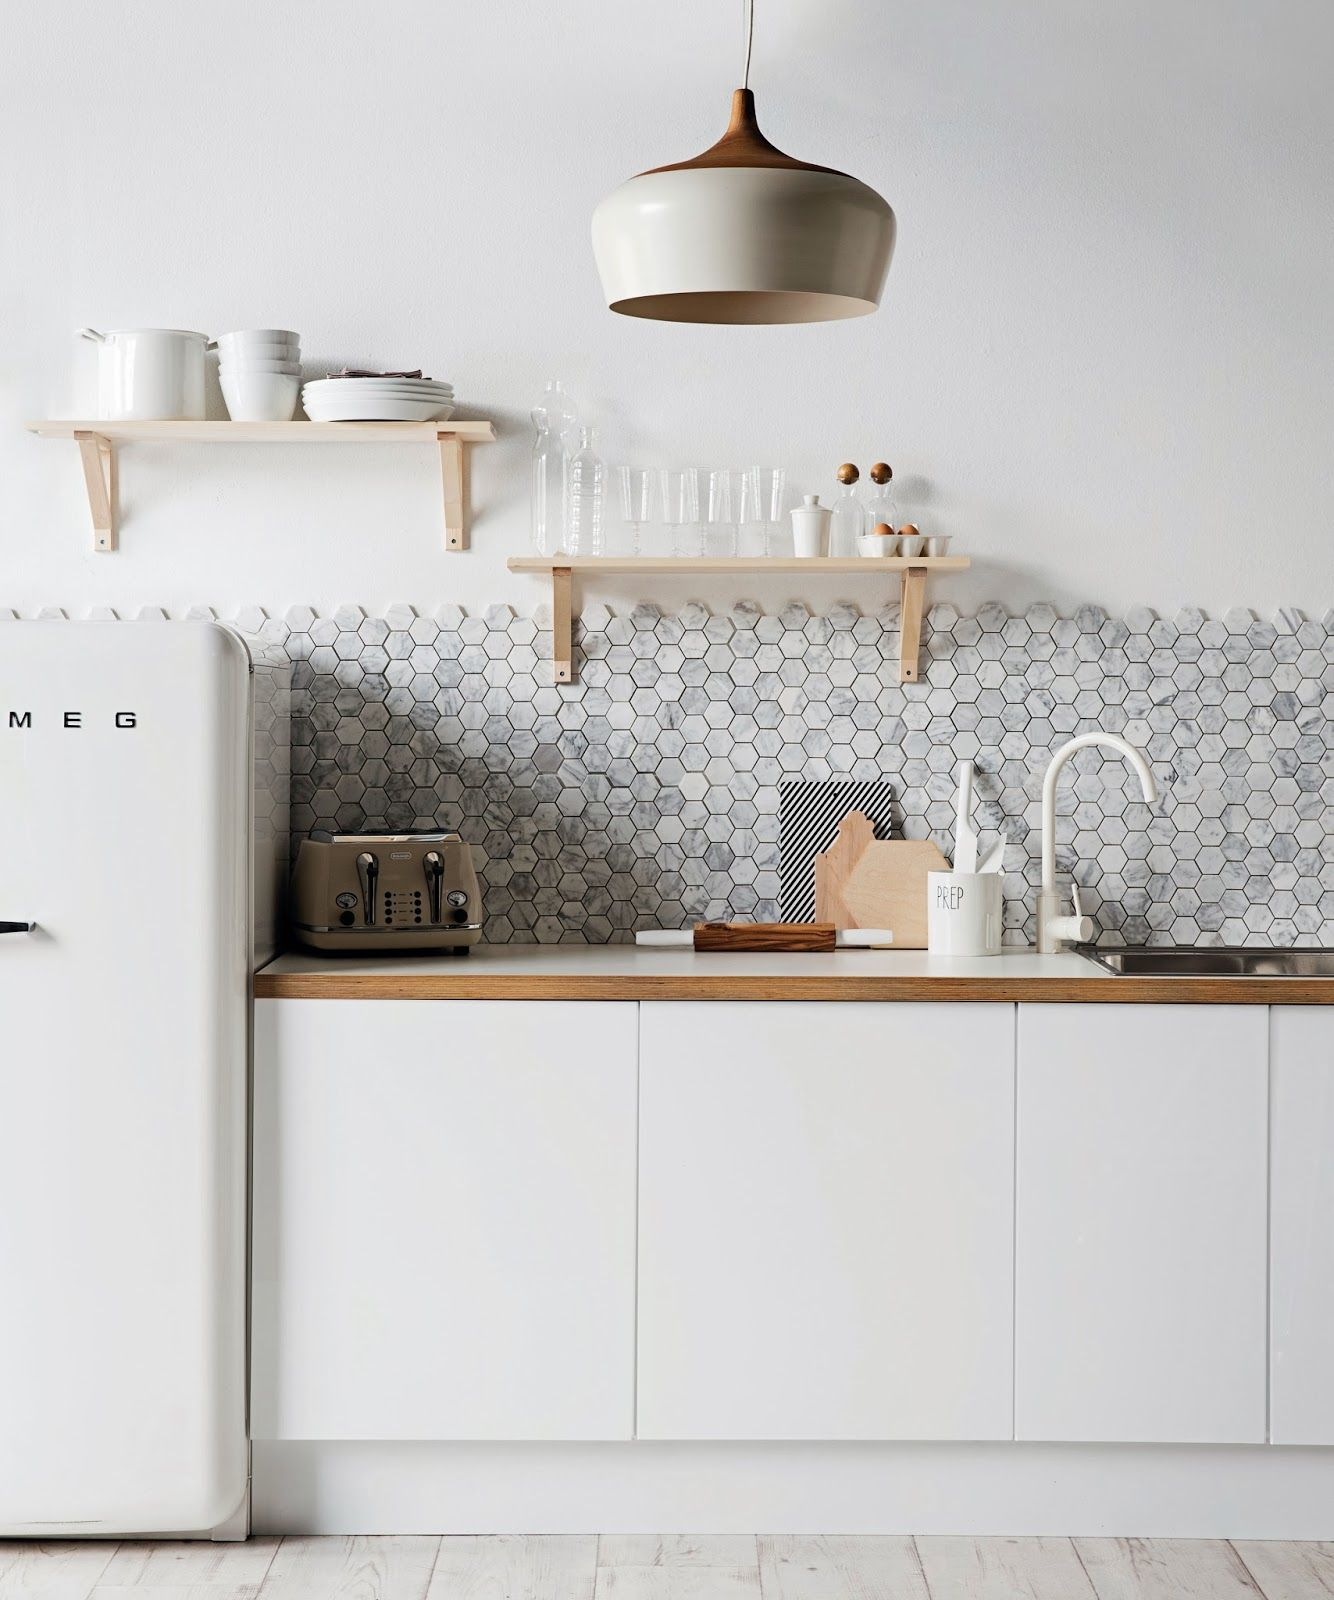 Hexagon Tile - Bathroom Ideas - Kitchen Design | Kitchen design ...